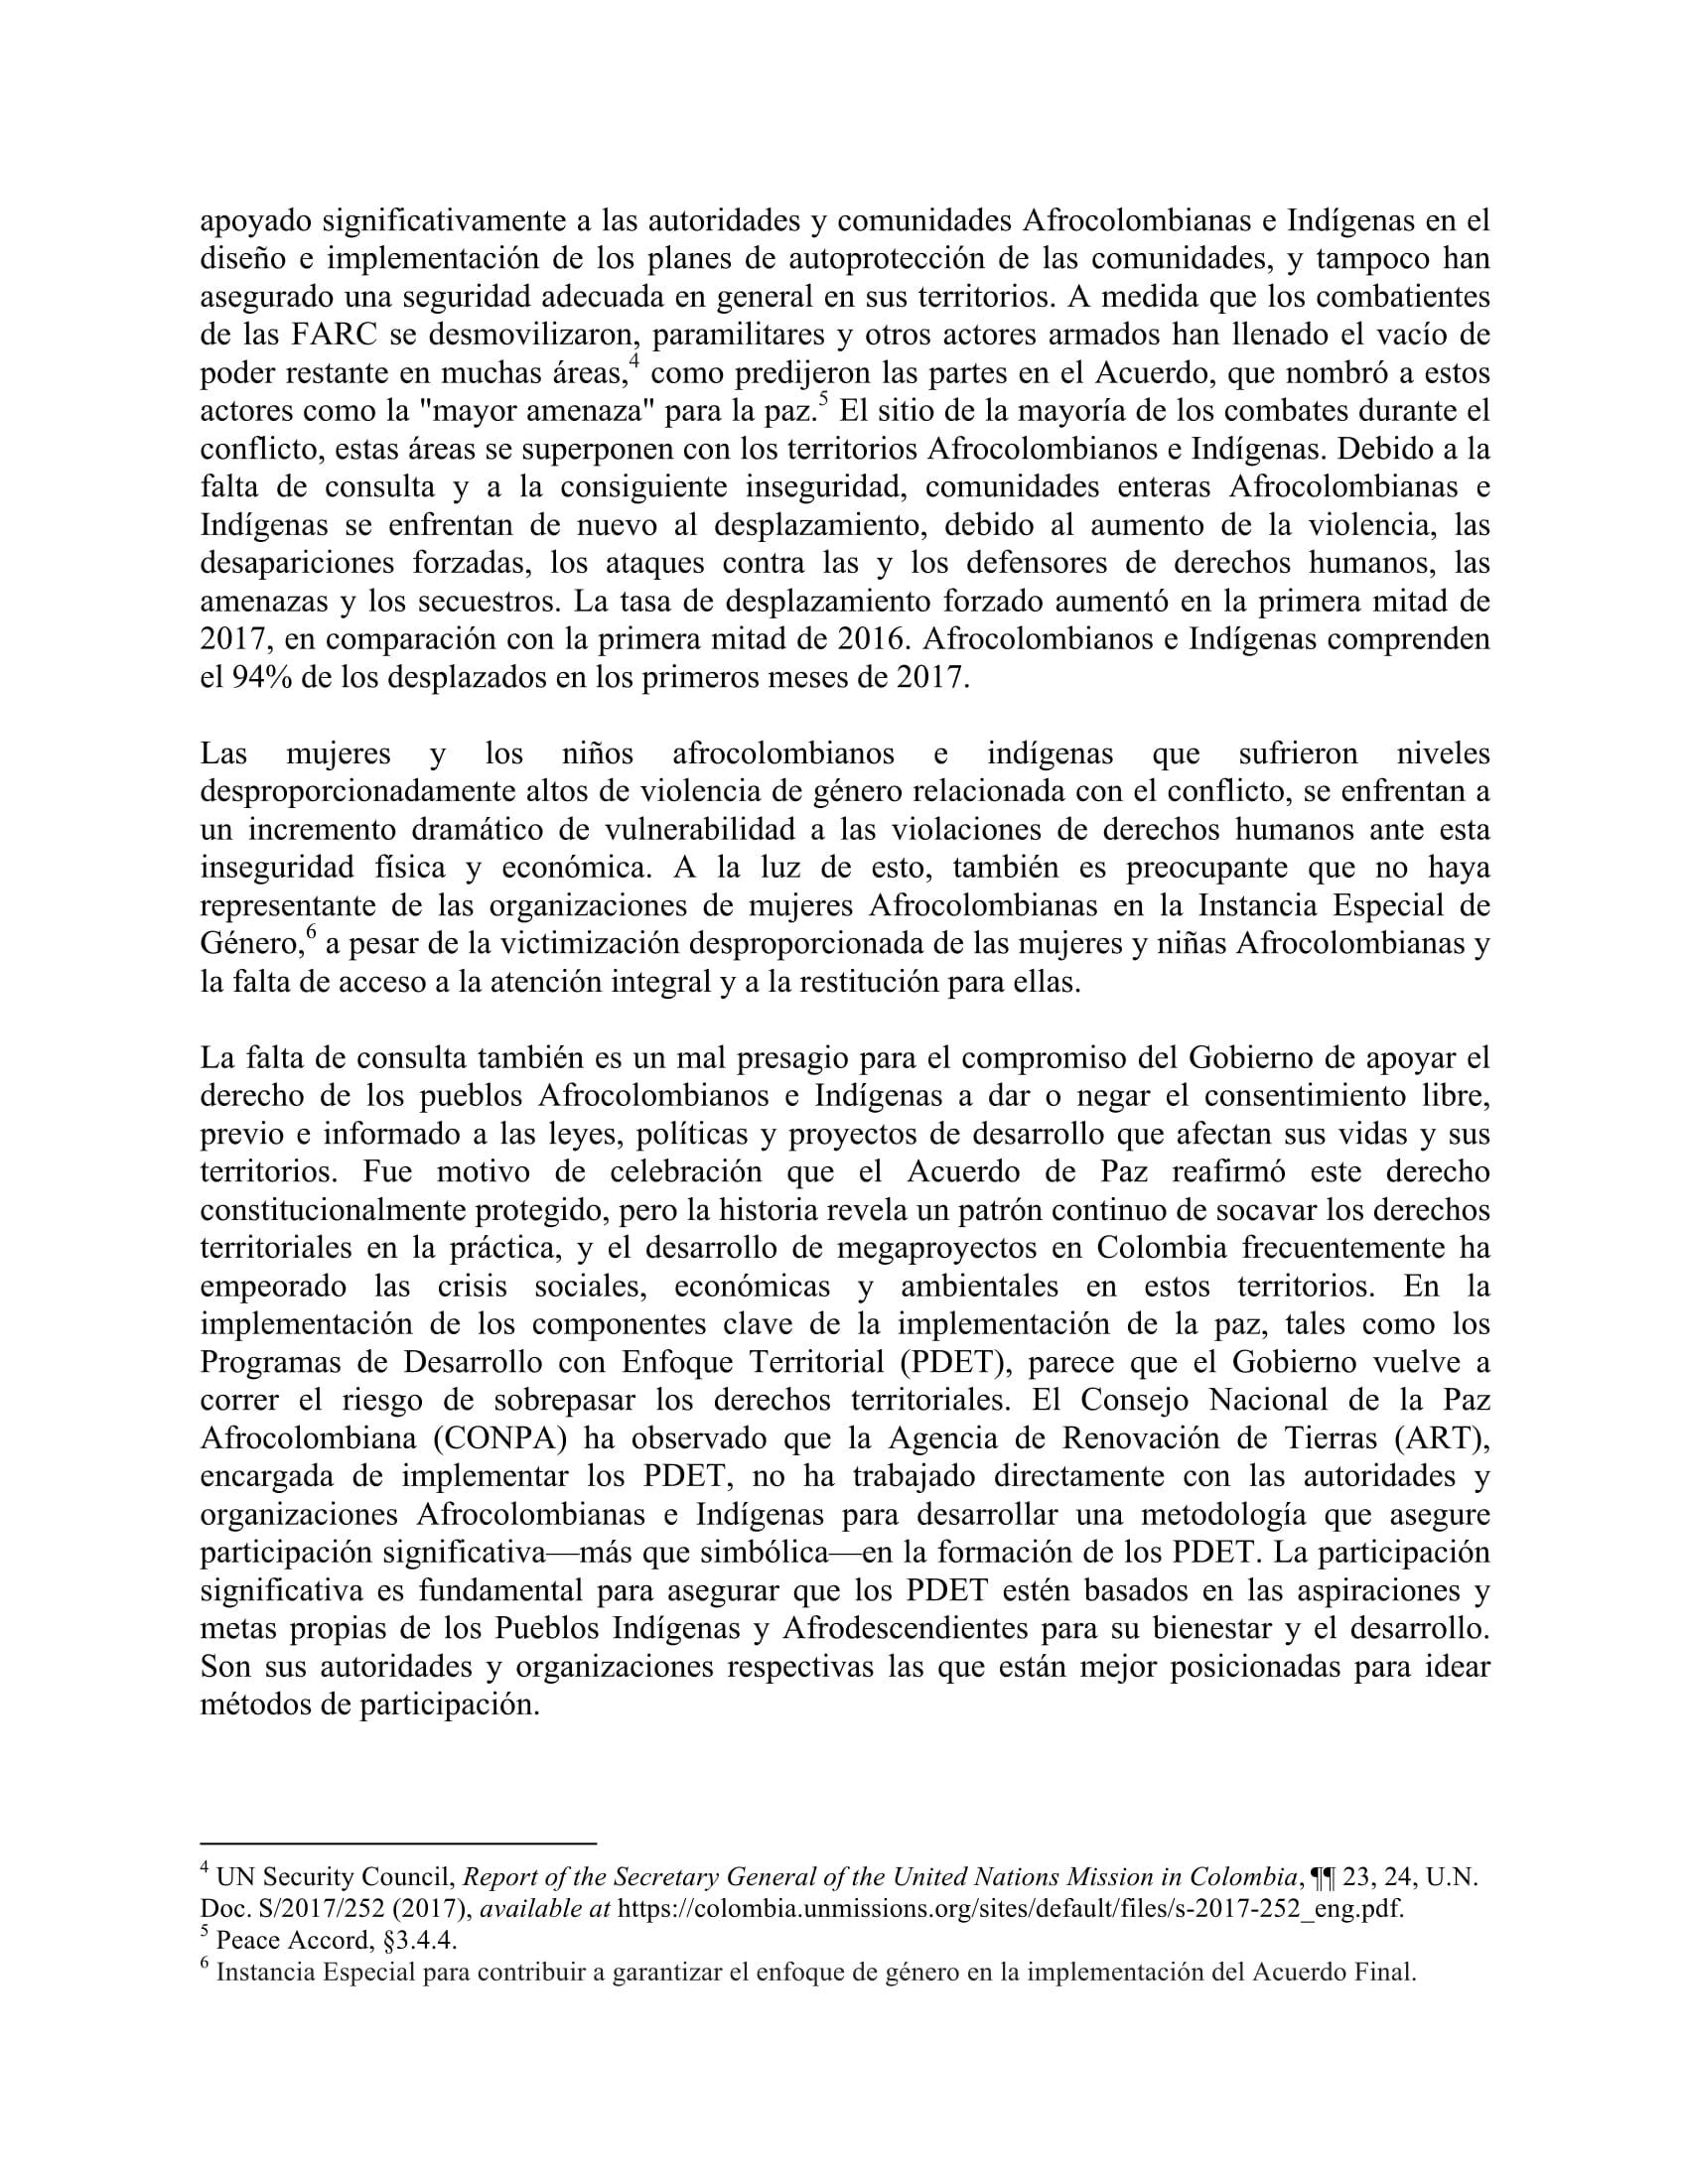 CartaSantosCsiviEspFINAL-2.jpg